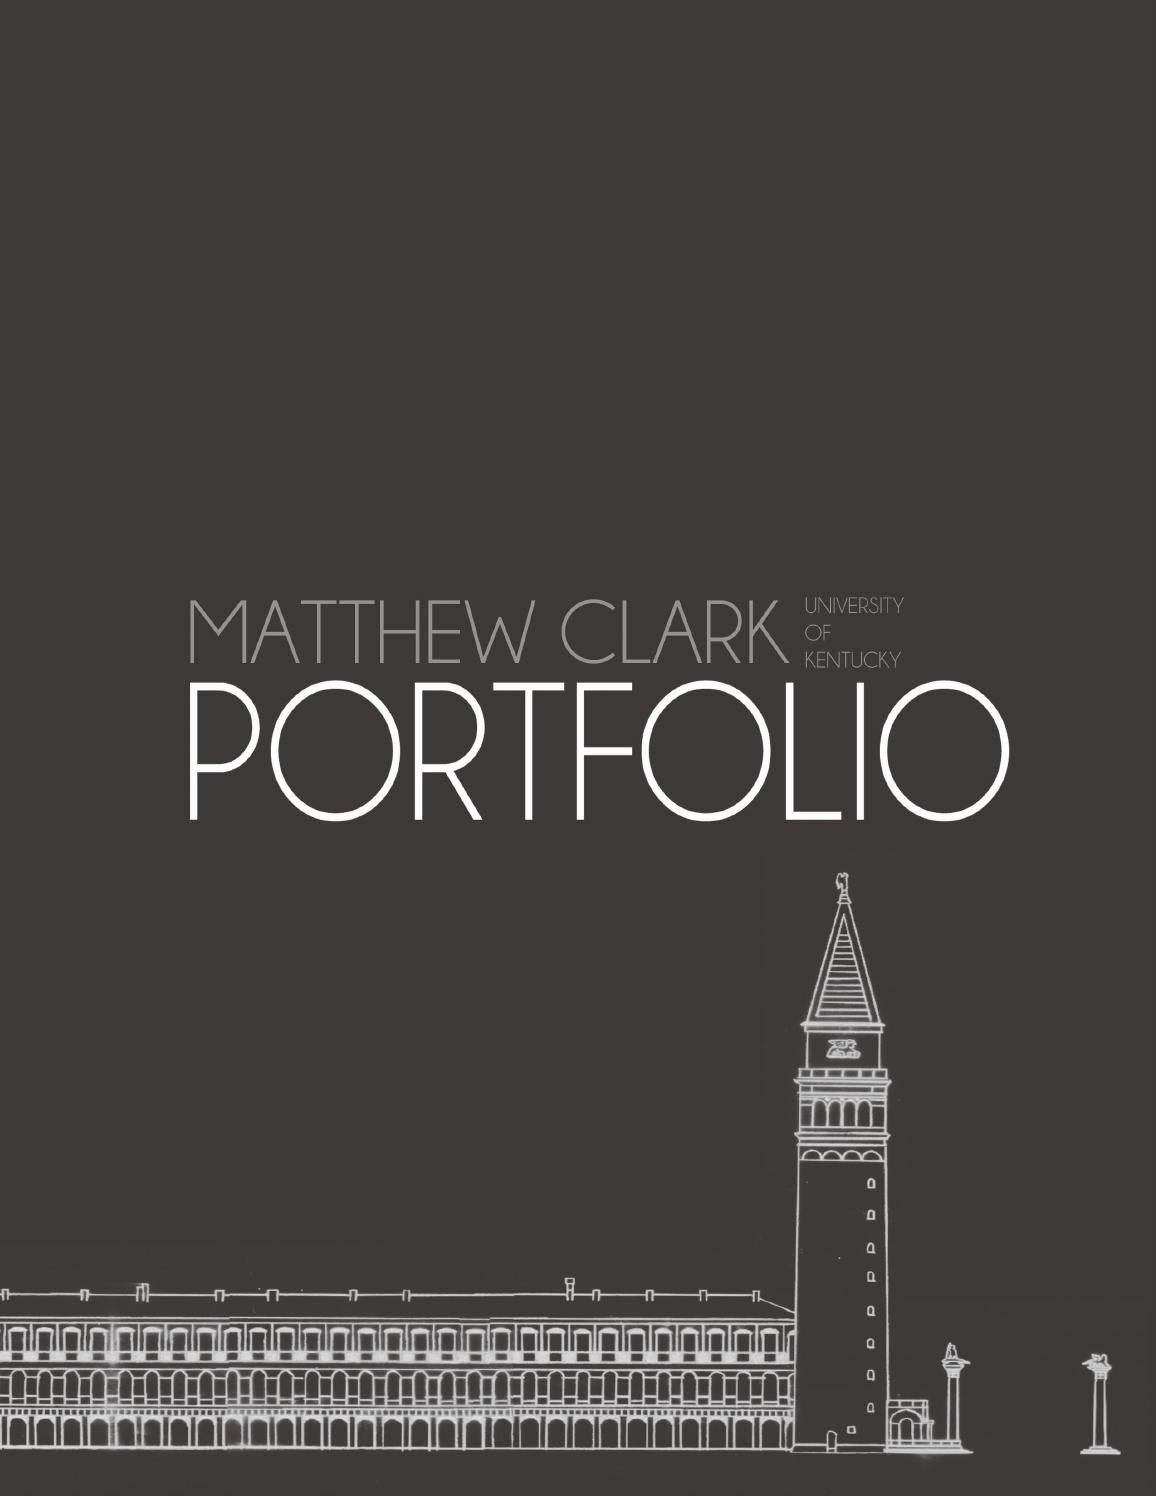 Cover Page for Portfolio Template New Matthew Clark Landscape Architecture Portfolio by Matthew